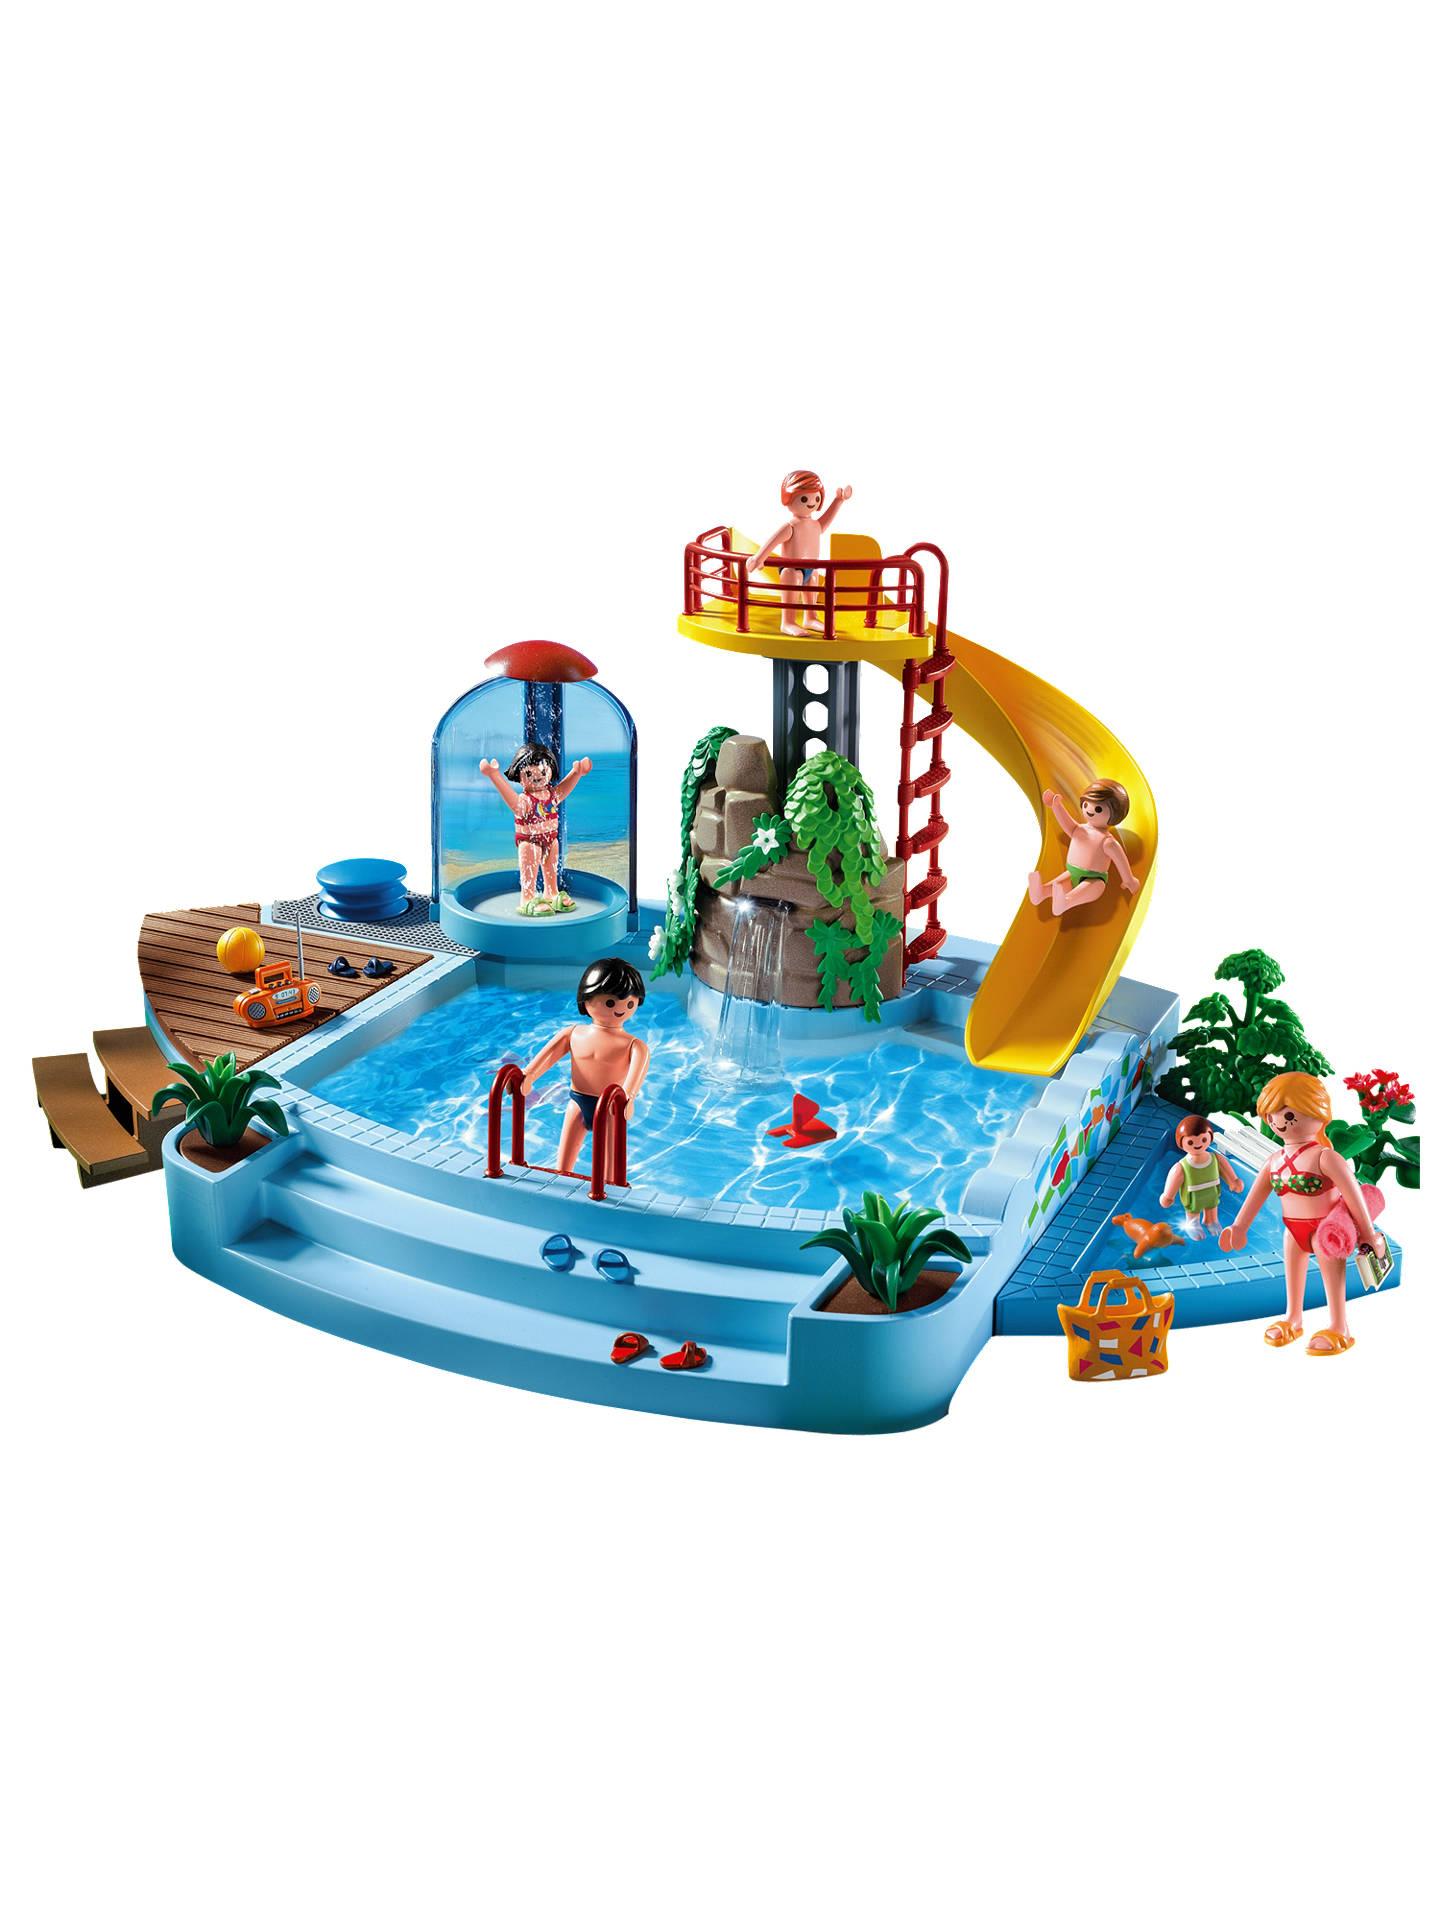 Playmobil summer fun pool and water slide at john lewis - Playmobil swimming pool with waterslide ...